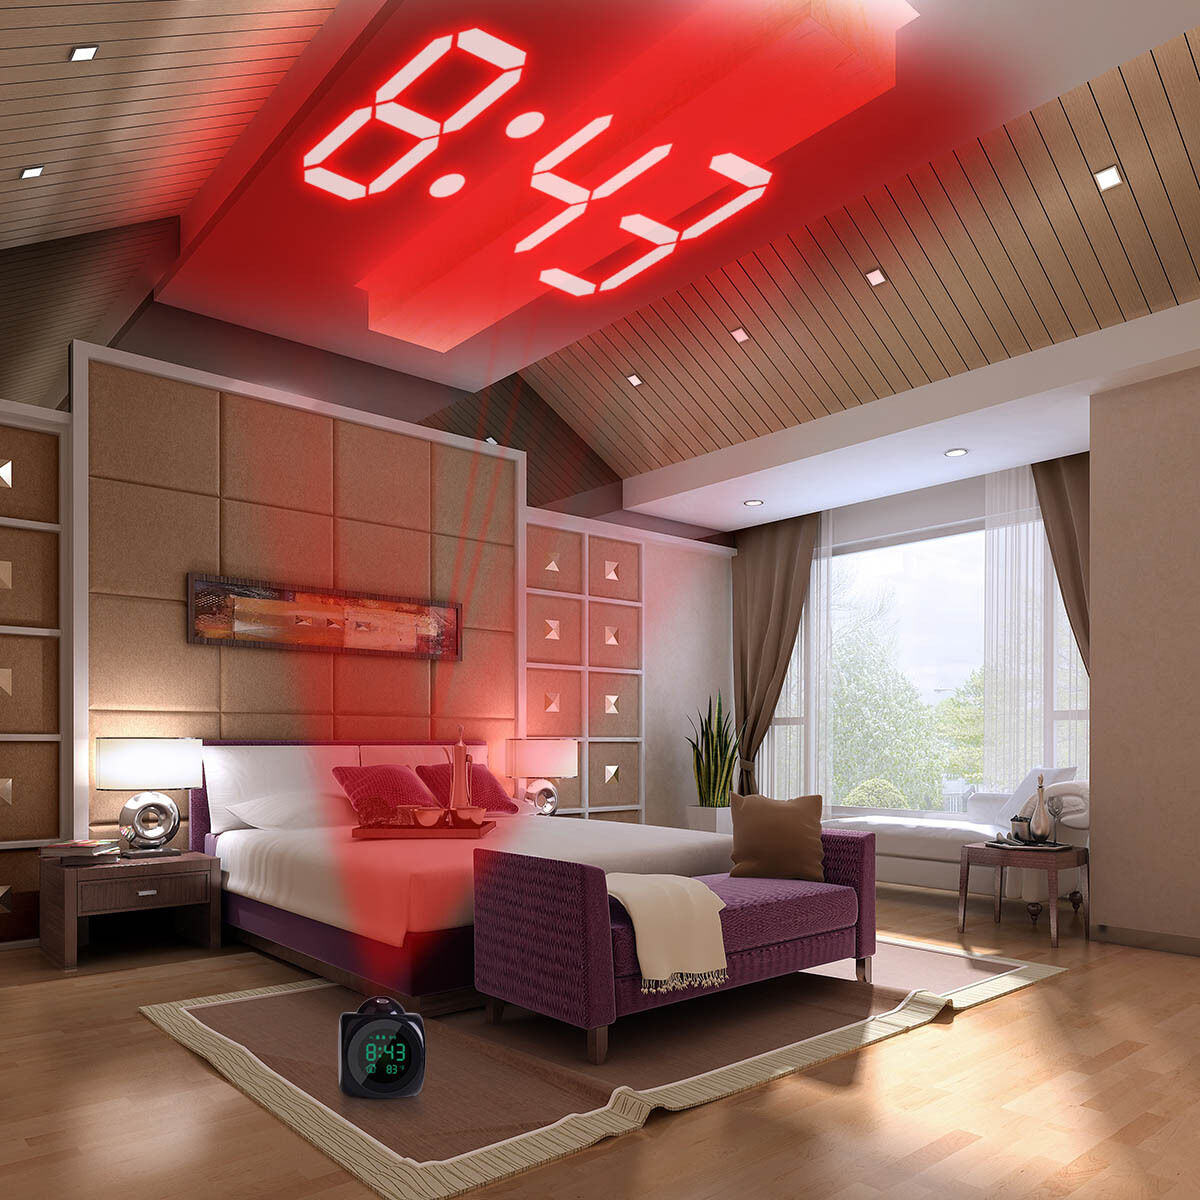 Mini Alarm Clock Digital LCD Voice Talking LED Projector Projection Temperature